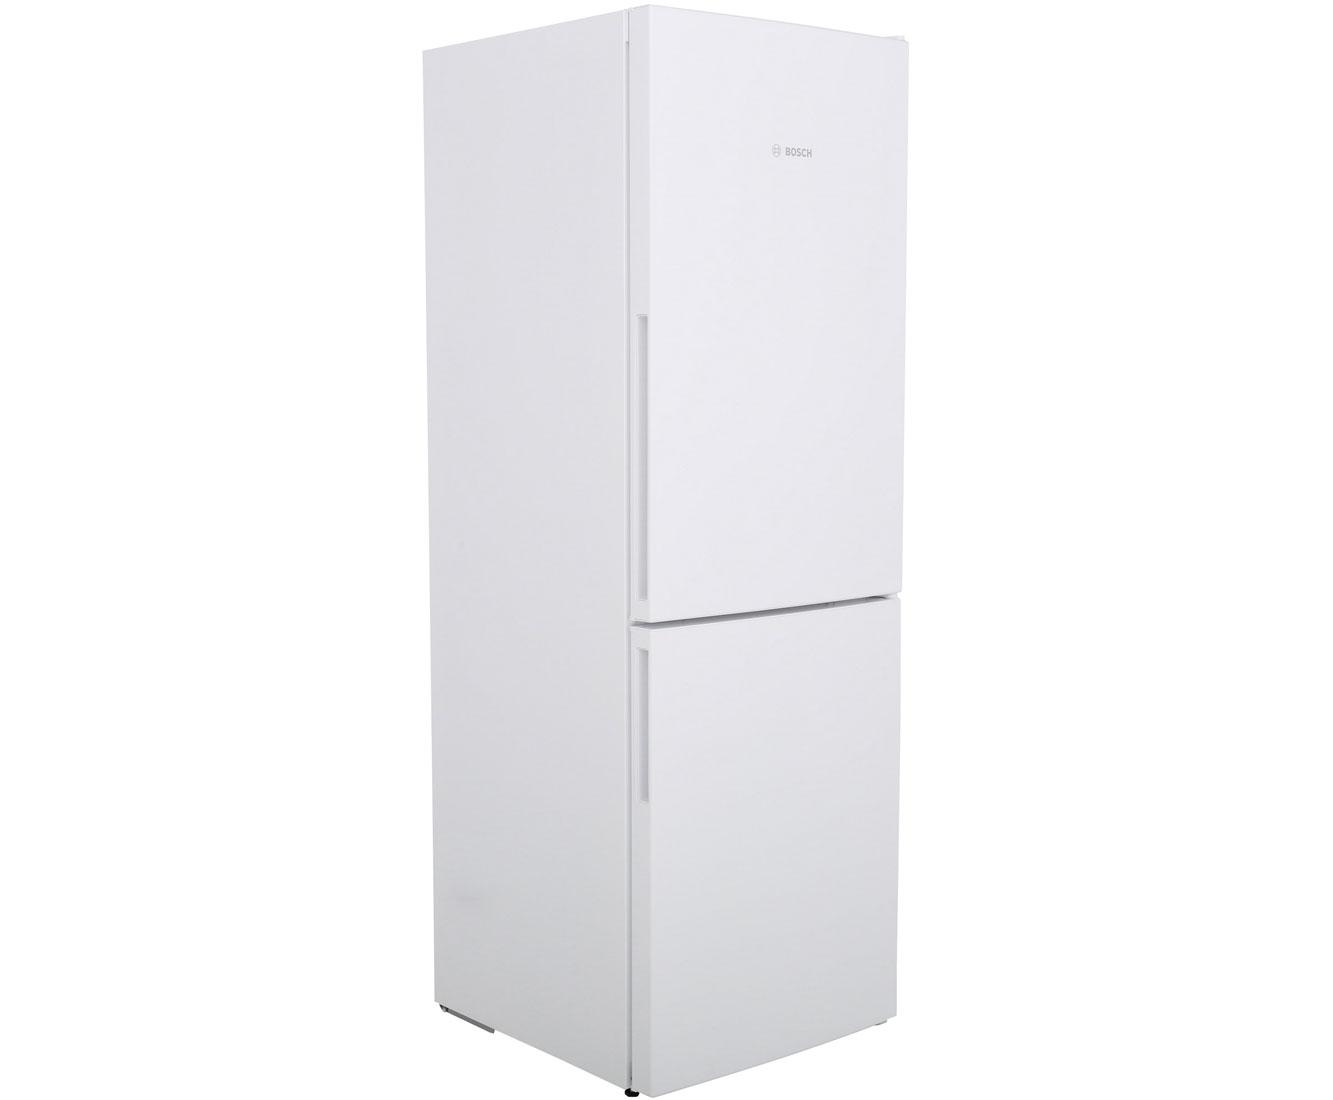 Bosch Kühlschrank Schalter : Bosch cooler kühlschrank schalter: gorenje 137126 flaschen